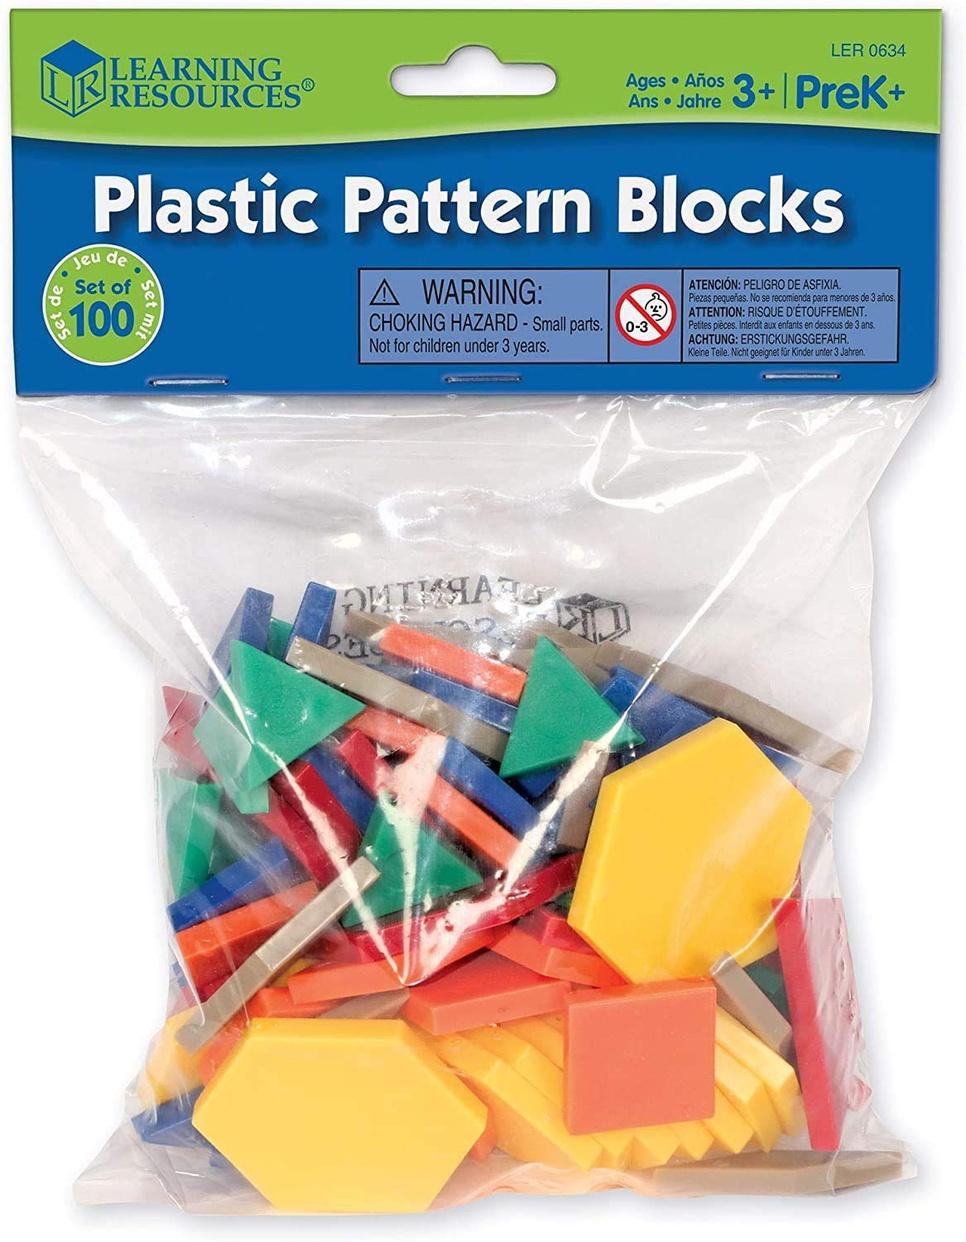 Learning Resources(ラーニングリソーシズ) パターンブロック ミニセットの商品画像